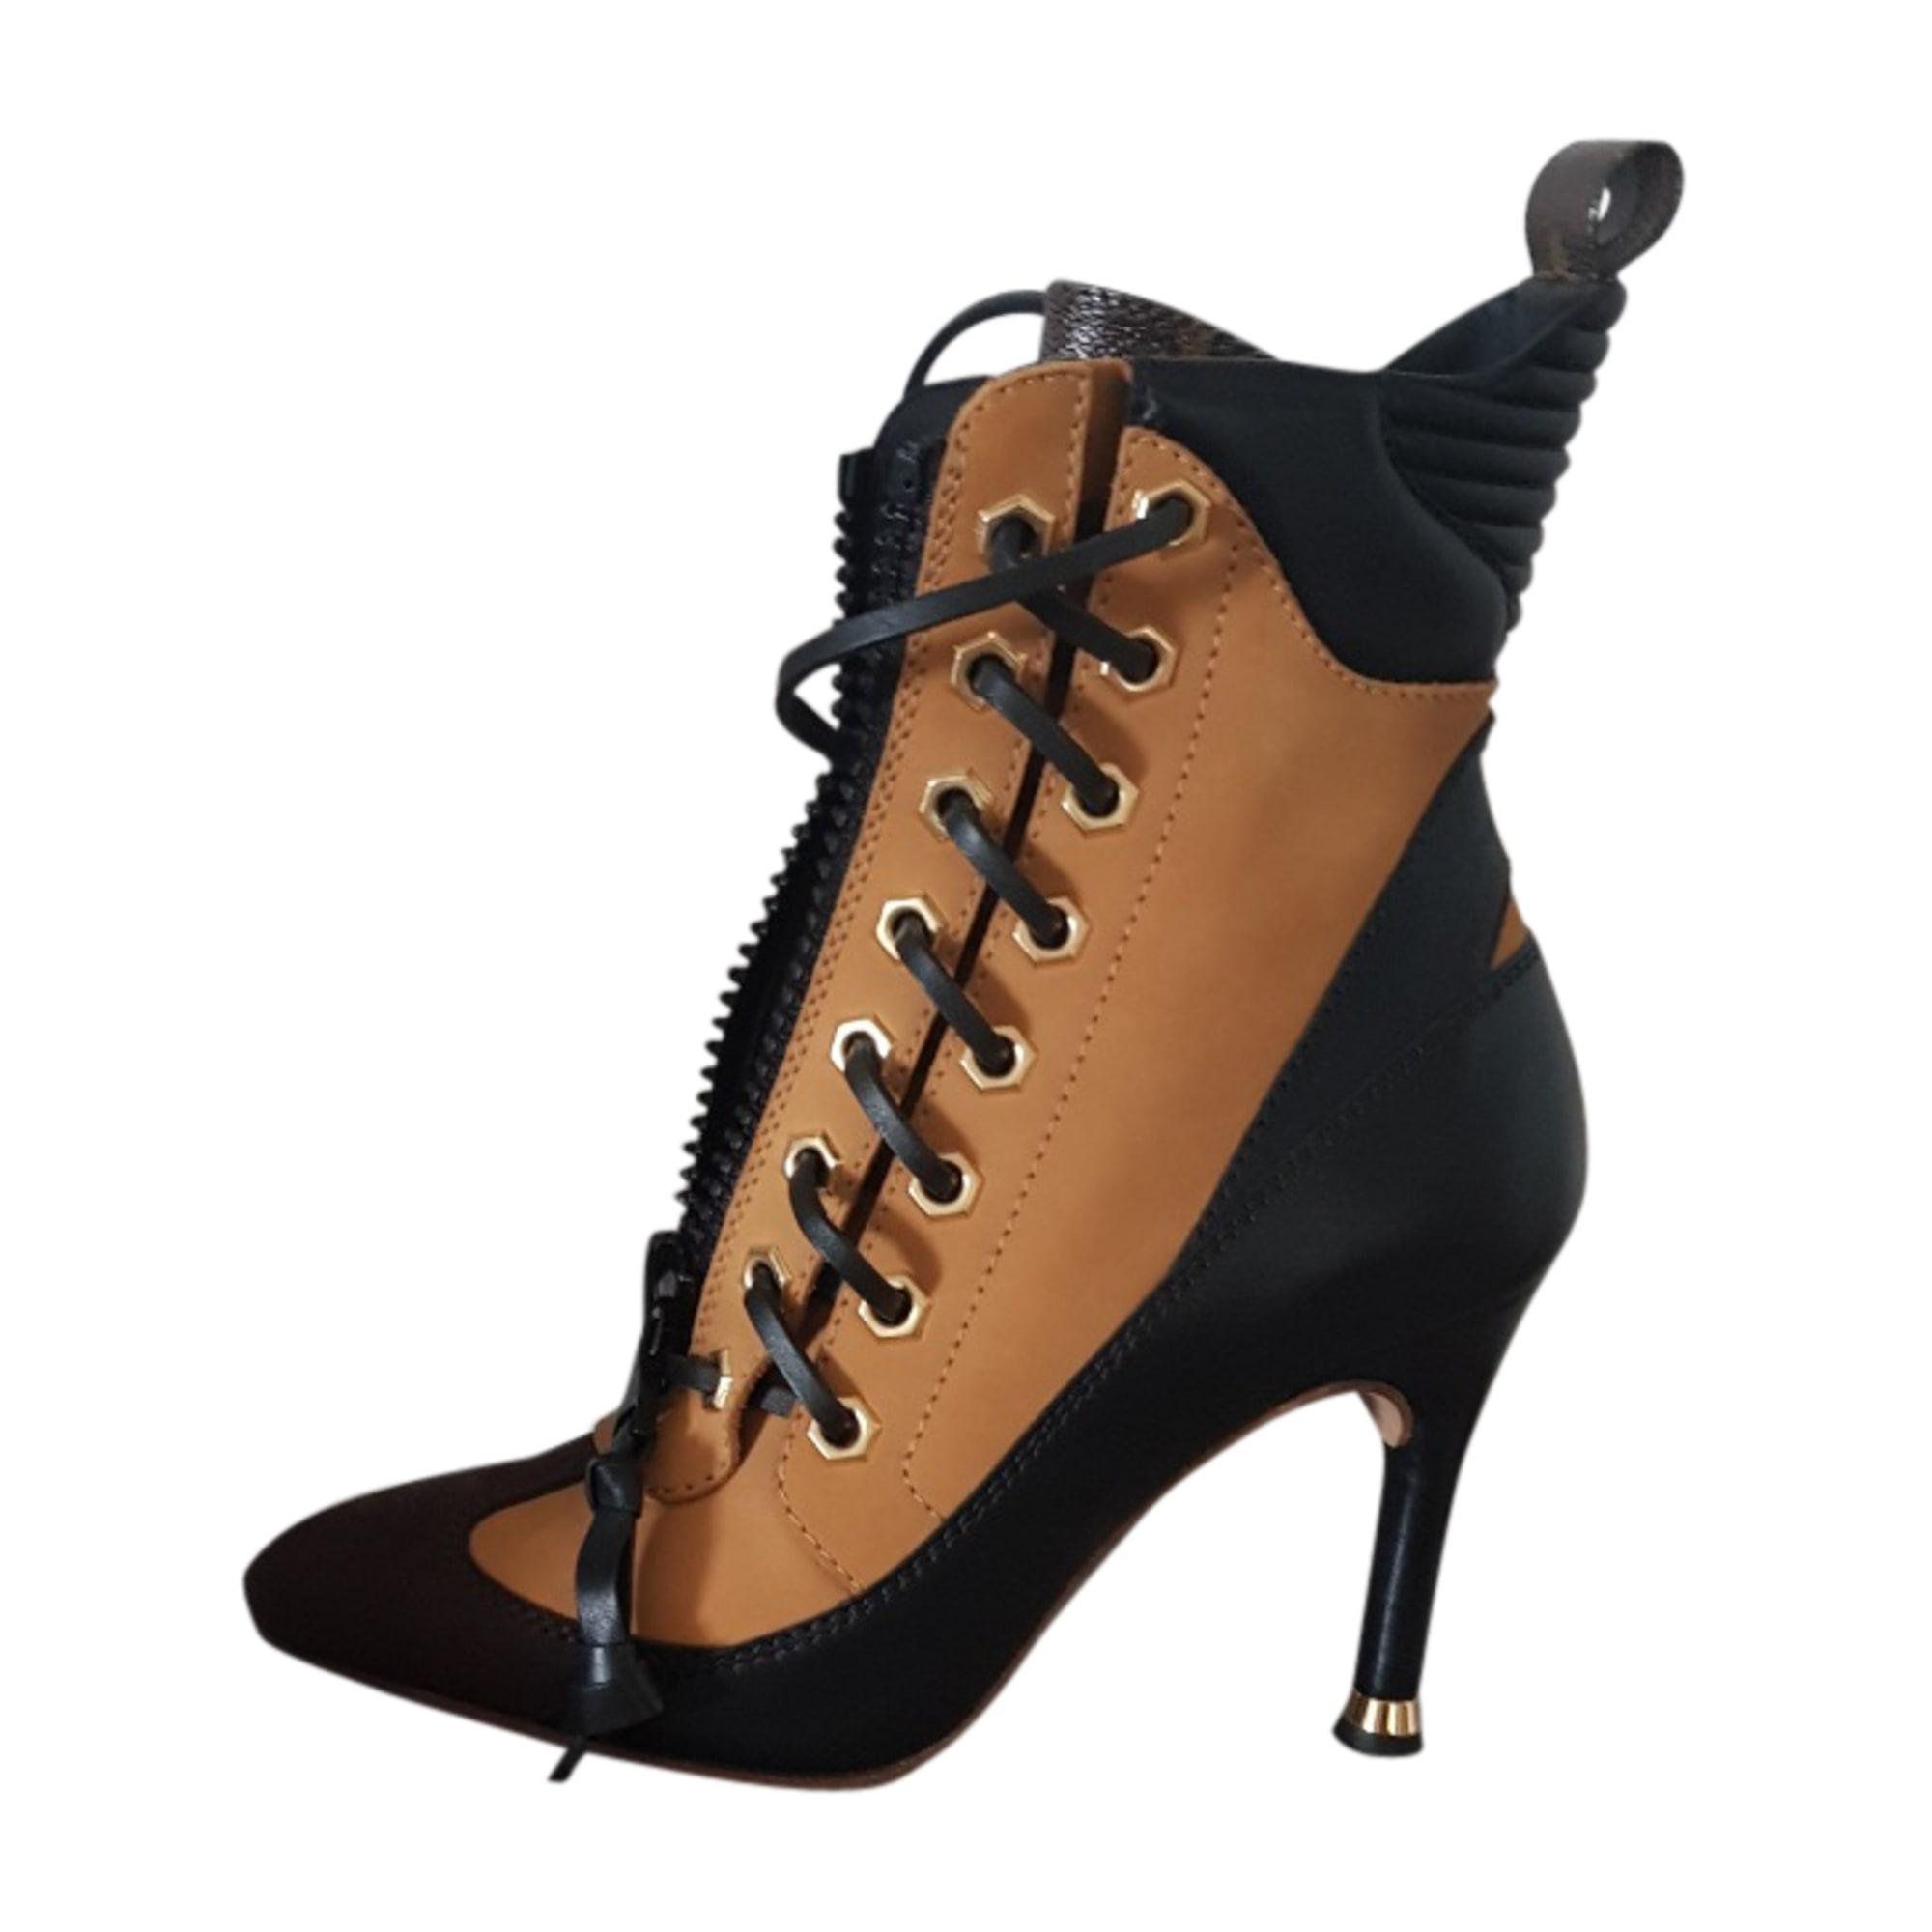 e9f8180556b4 High Heel Ankle Boots LOUIS VUITTON 36 beige - 7701703